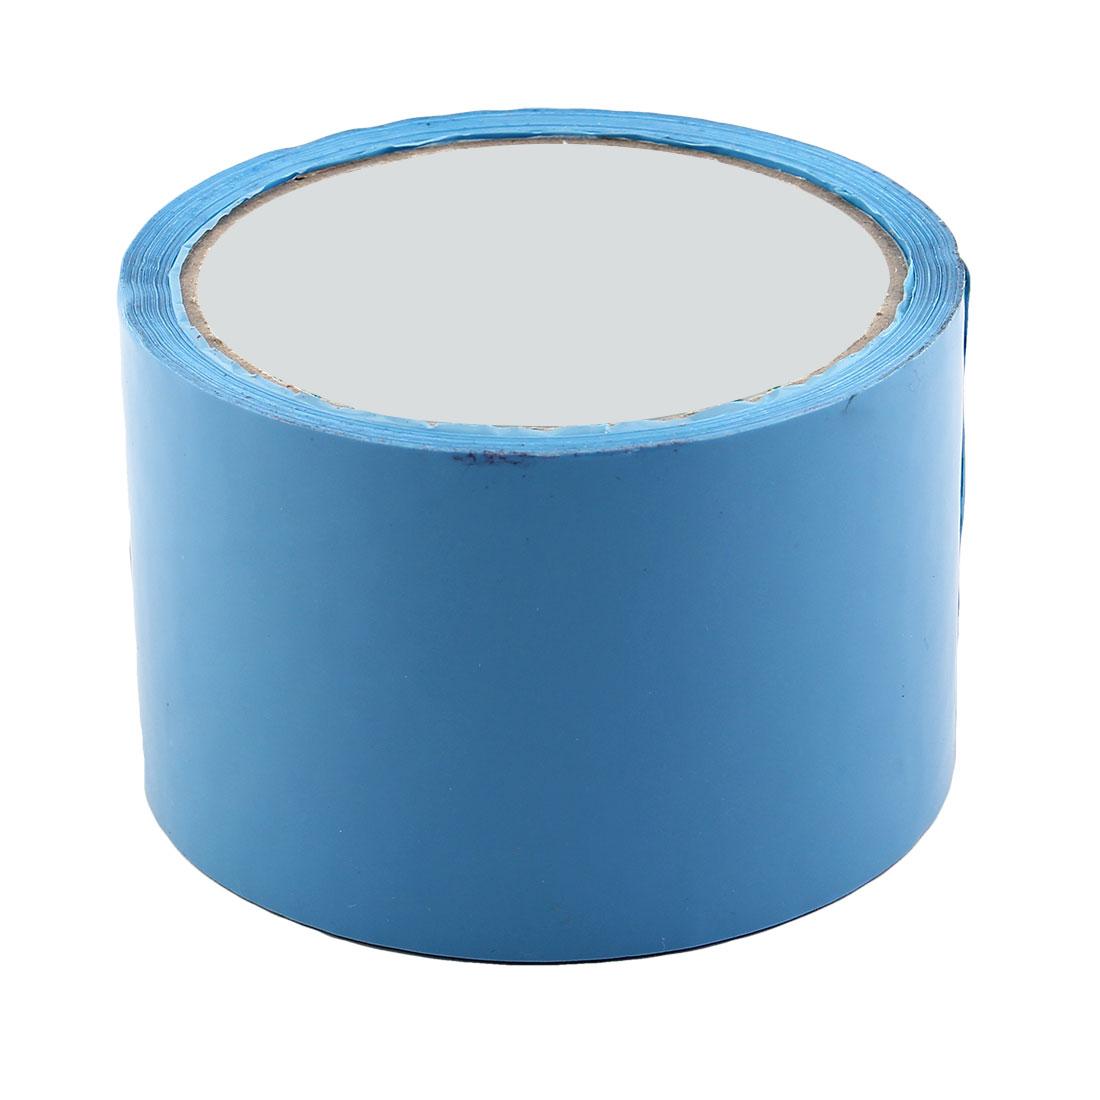 Shipping PVC Box Carton Sealing Adhesive Tape Blue 2.4'' x 32.8 Yards(98.4 Ft)